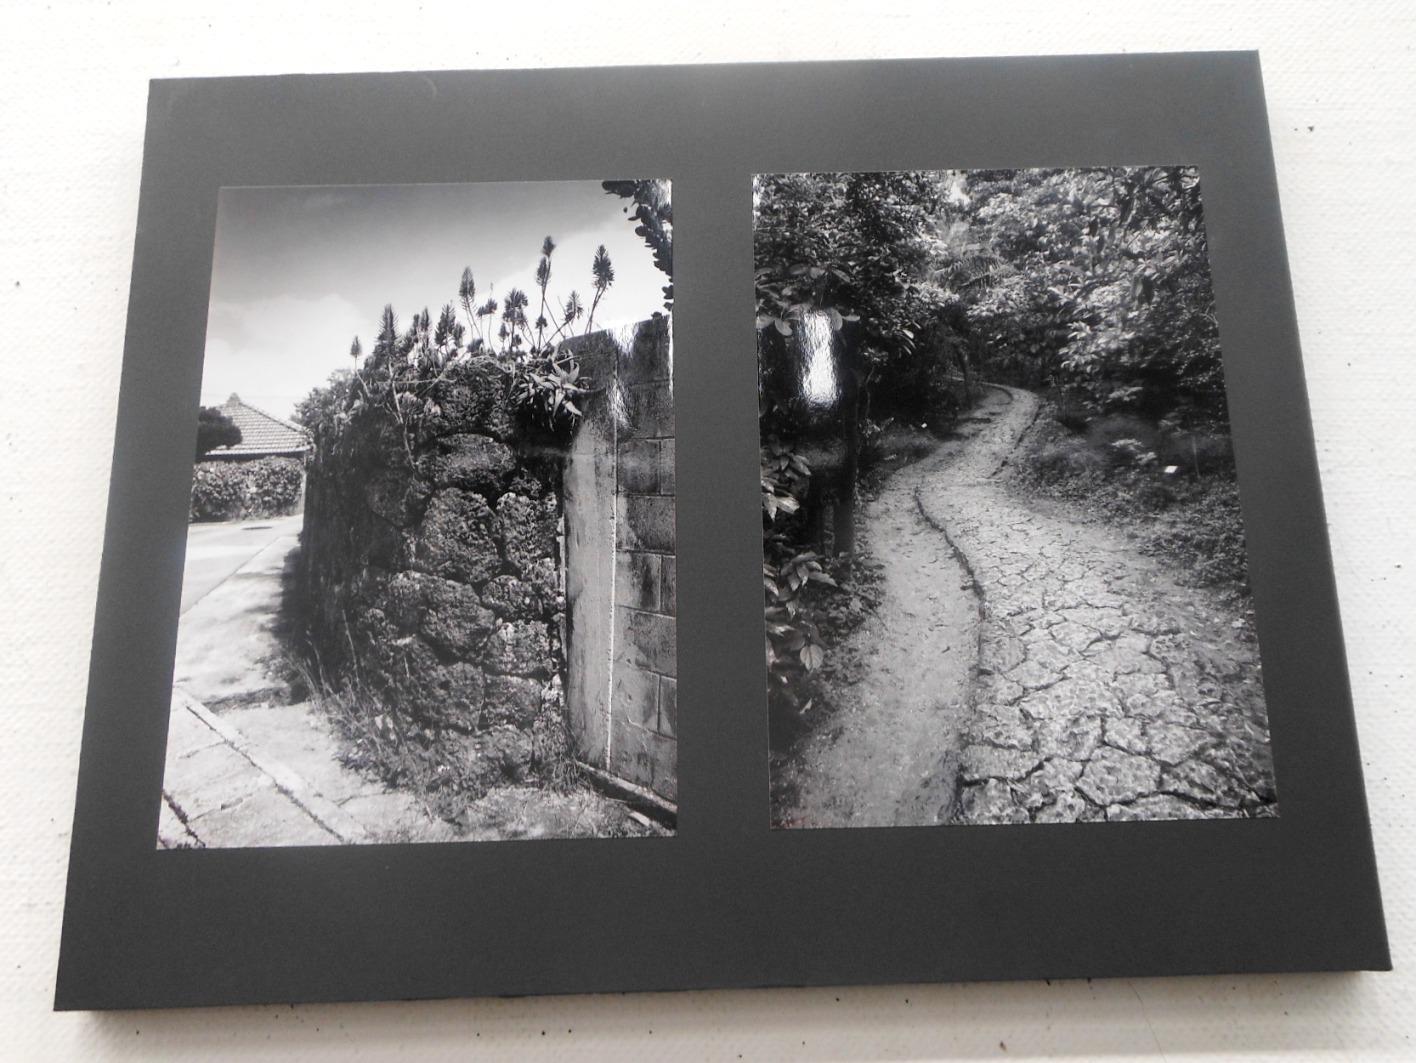 1885)②「写真クラブ「BePHaT!!」 第9回作品展 『夢 Photo 2012』」市民g. 終了11月21日(水)~11月25日(日)_f0126829_23285531.jpg